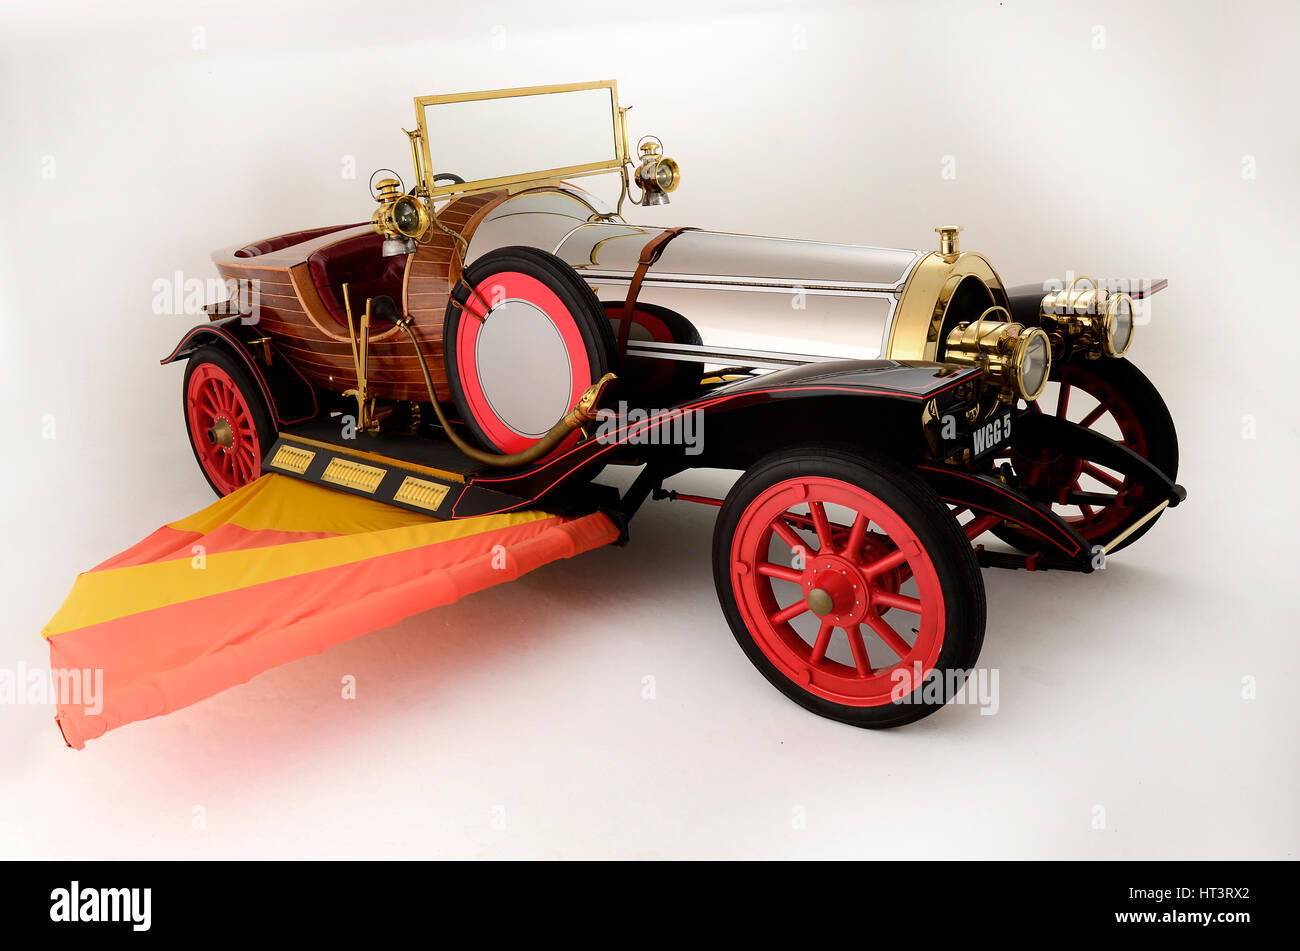 Chitty Chitty Bang Bang Film Car Replica   Stock Image